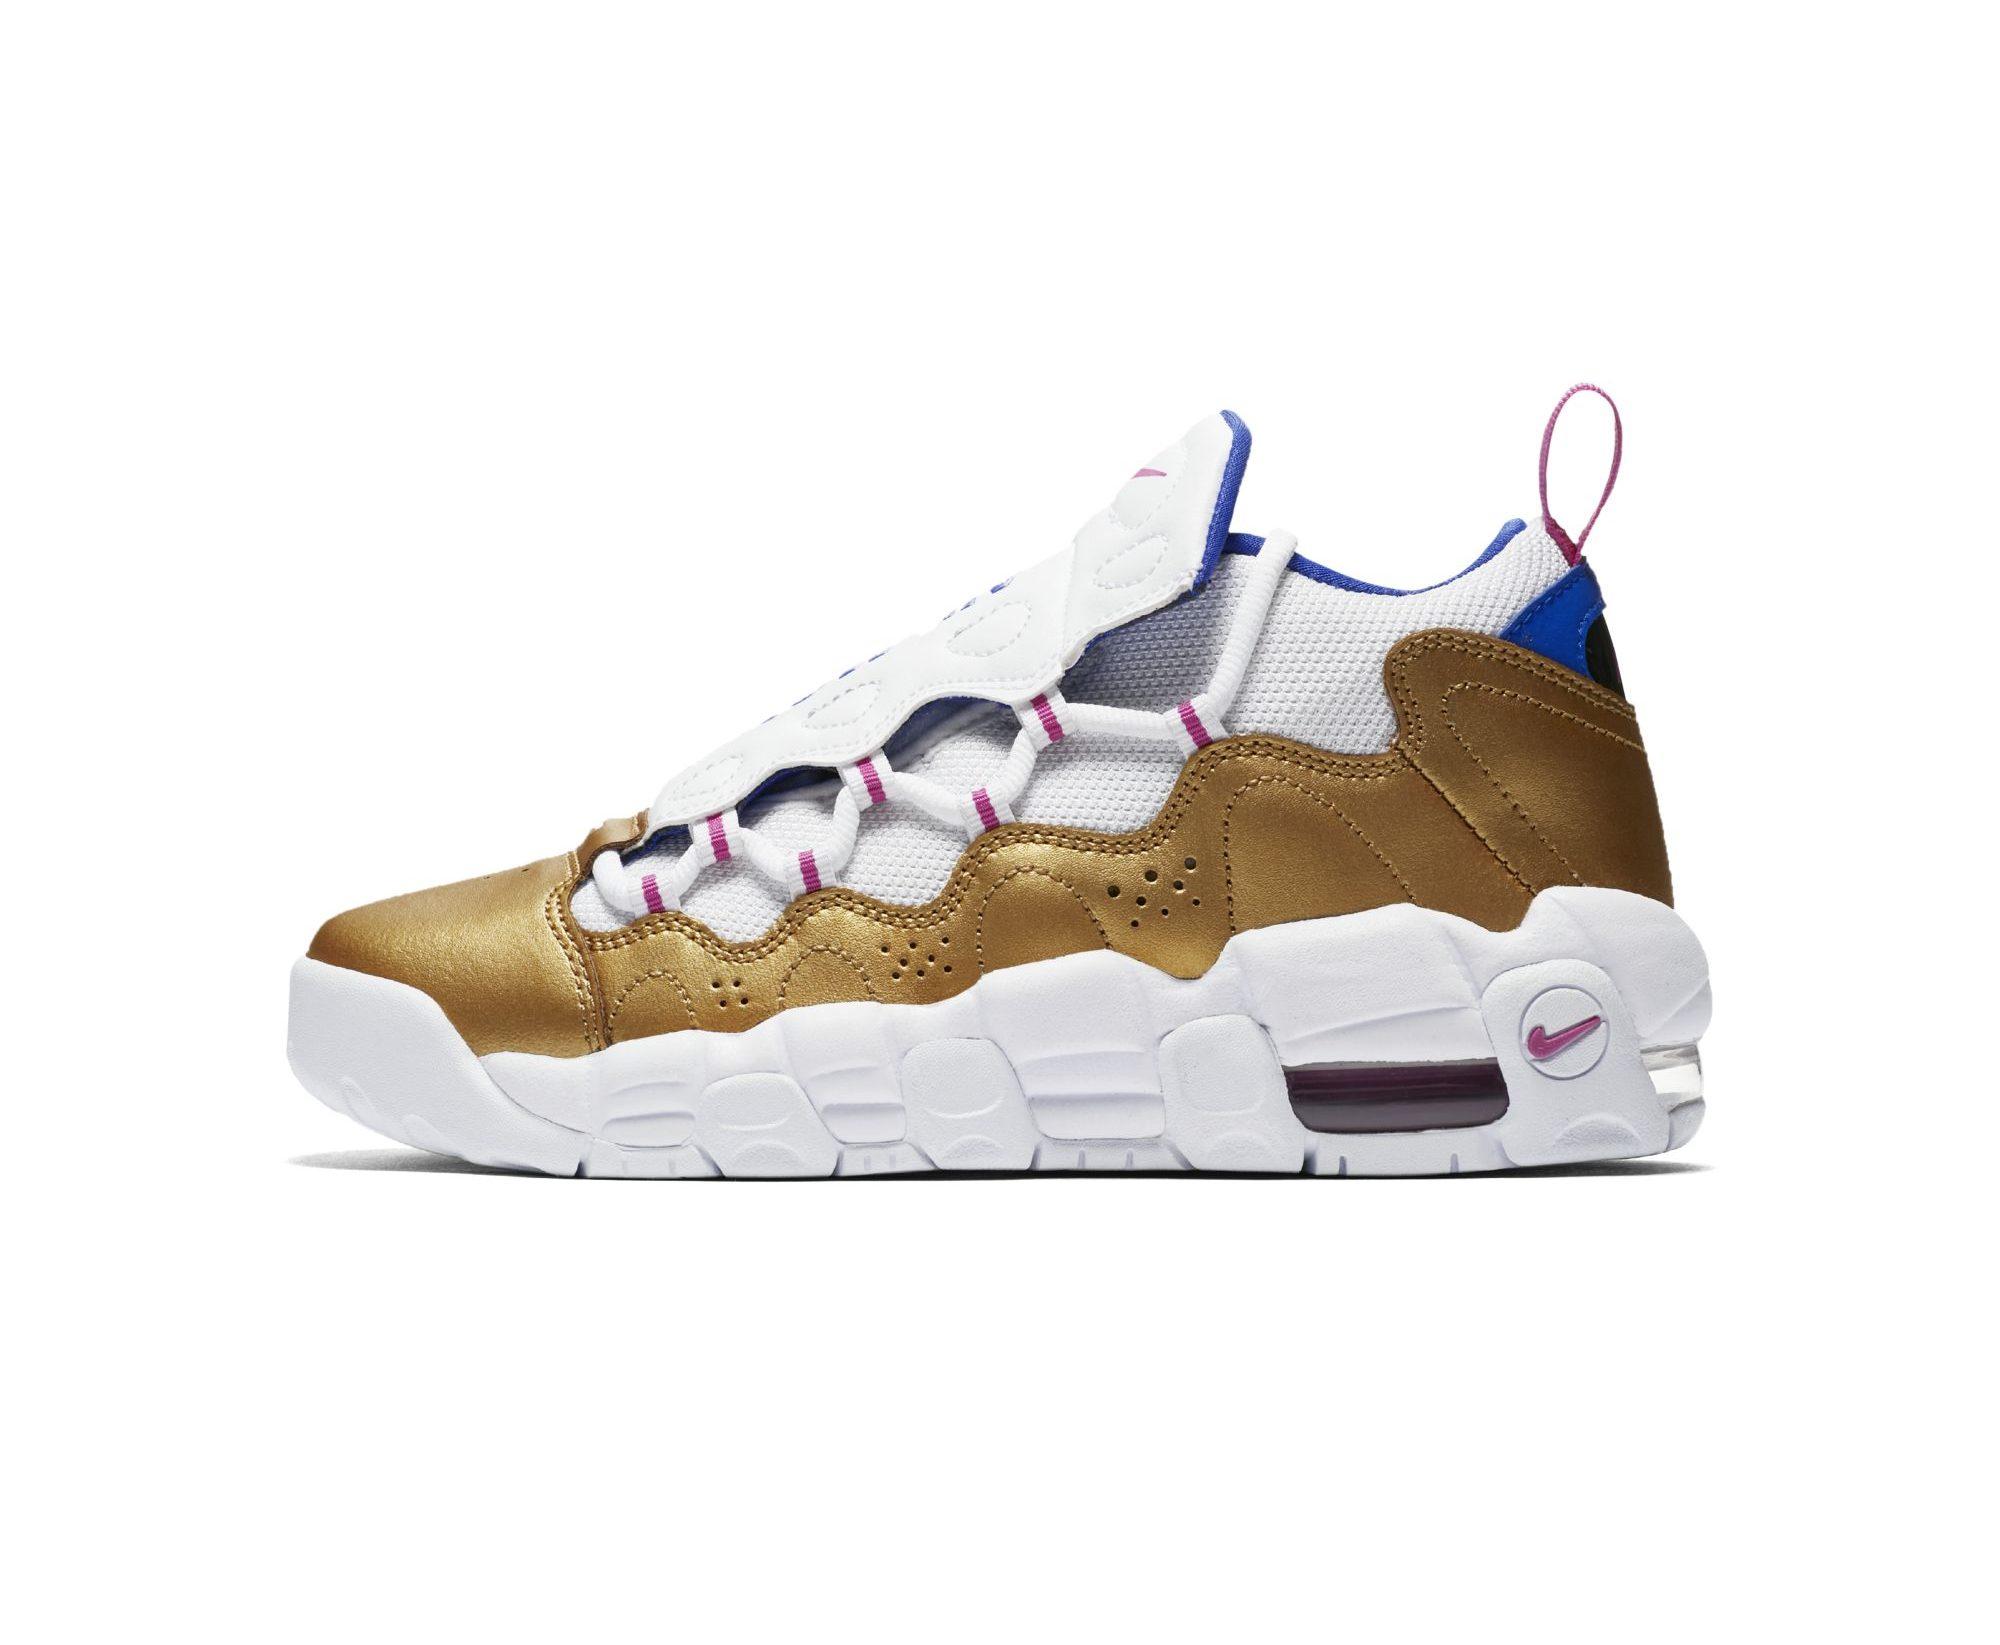 755c091a89852 Basketball / Kicks On Court / Nike / Release Reminder ...